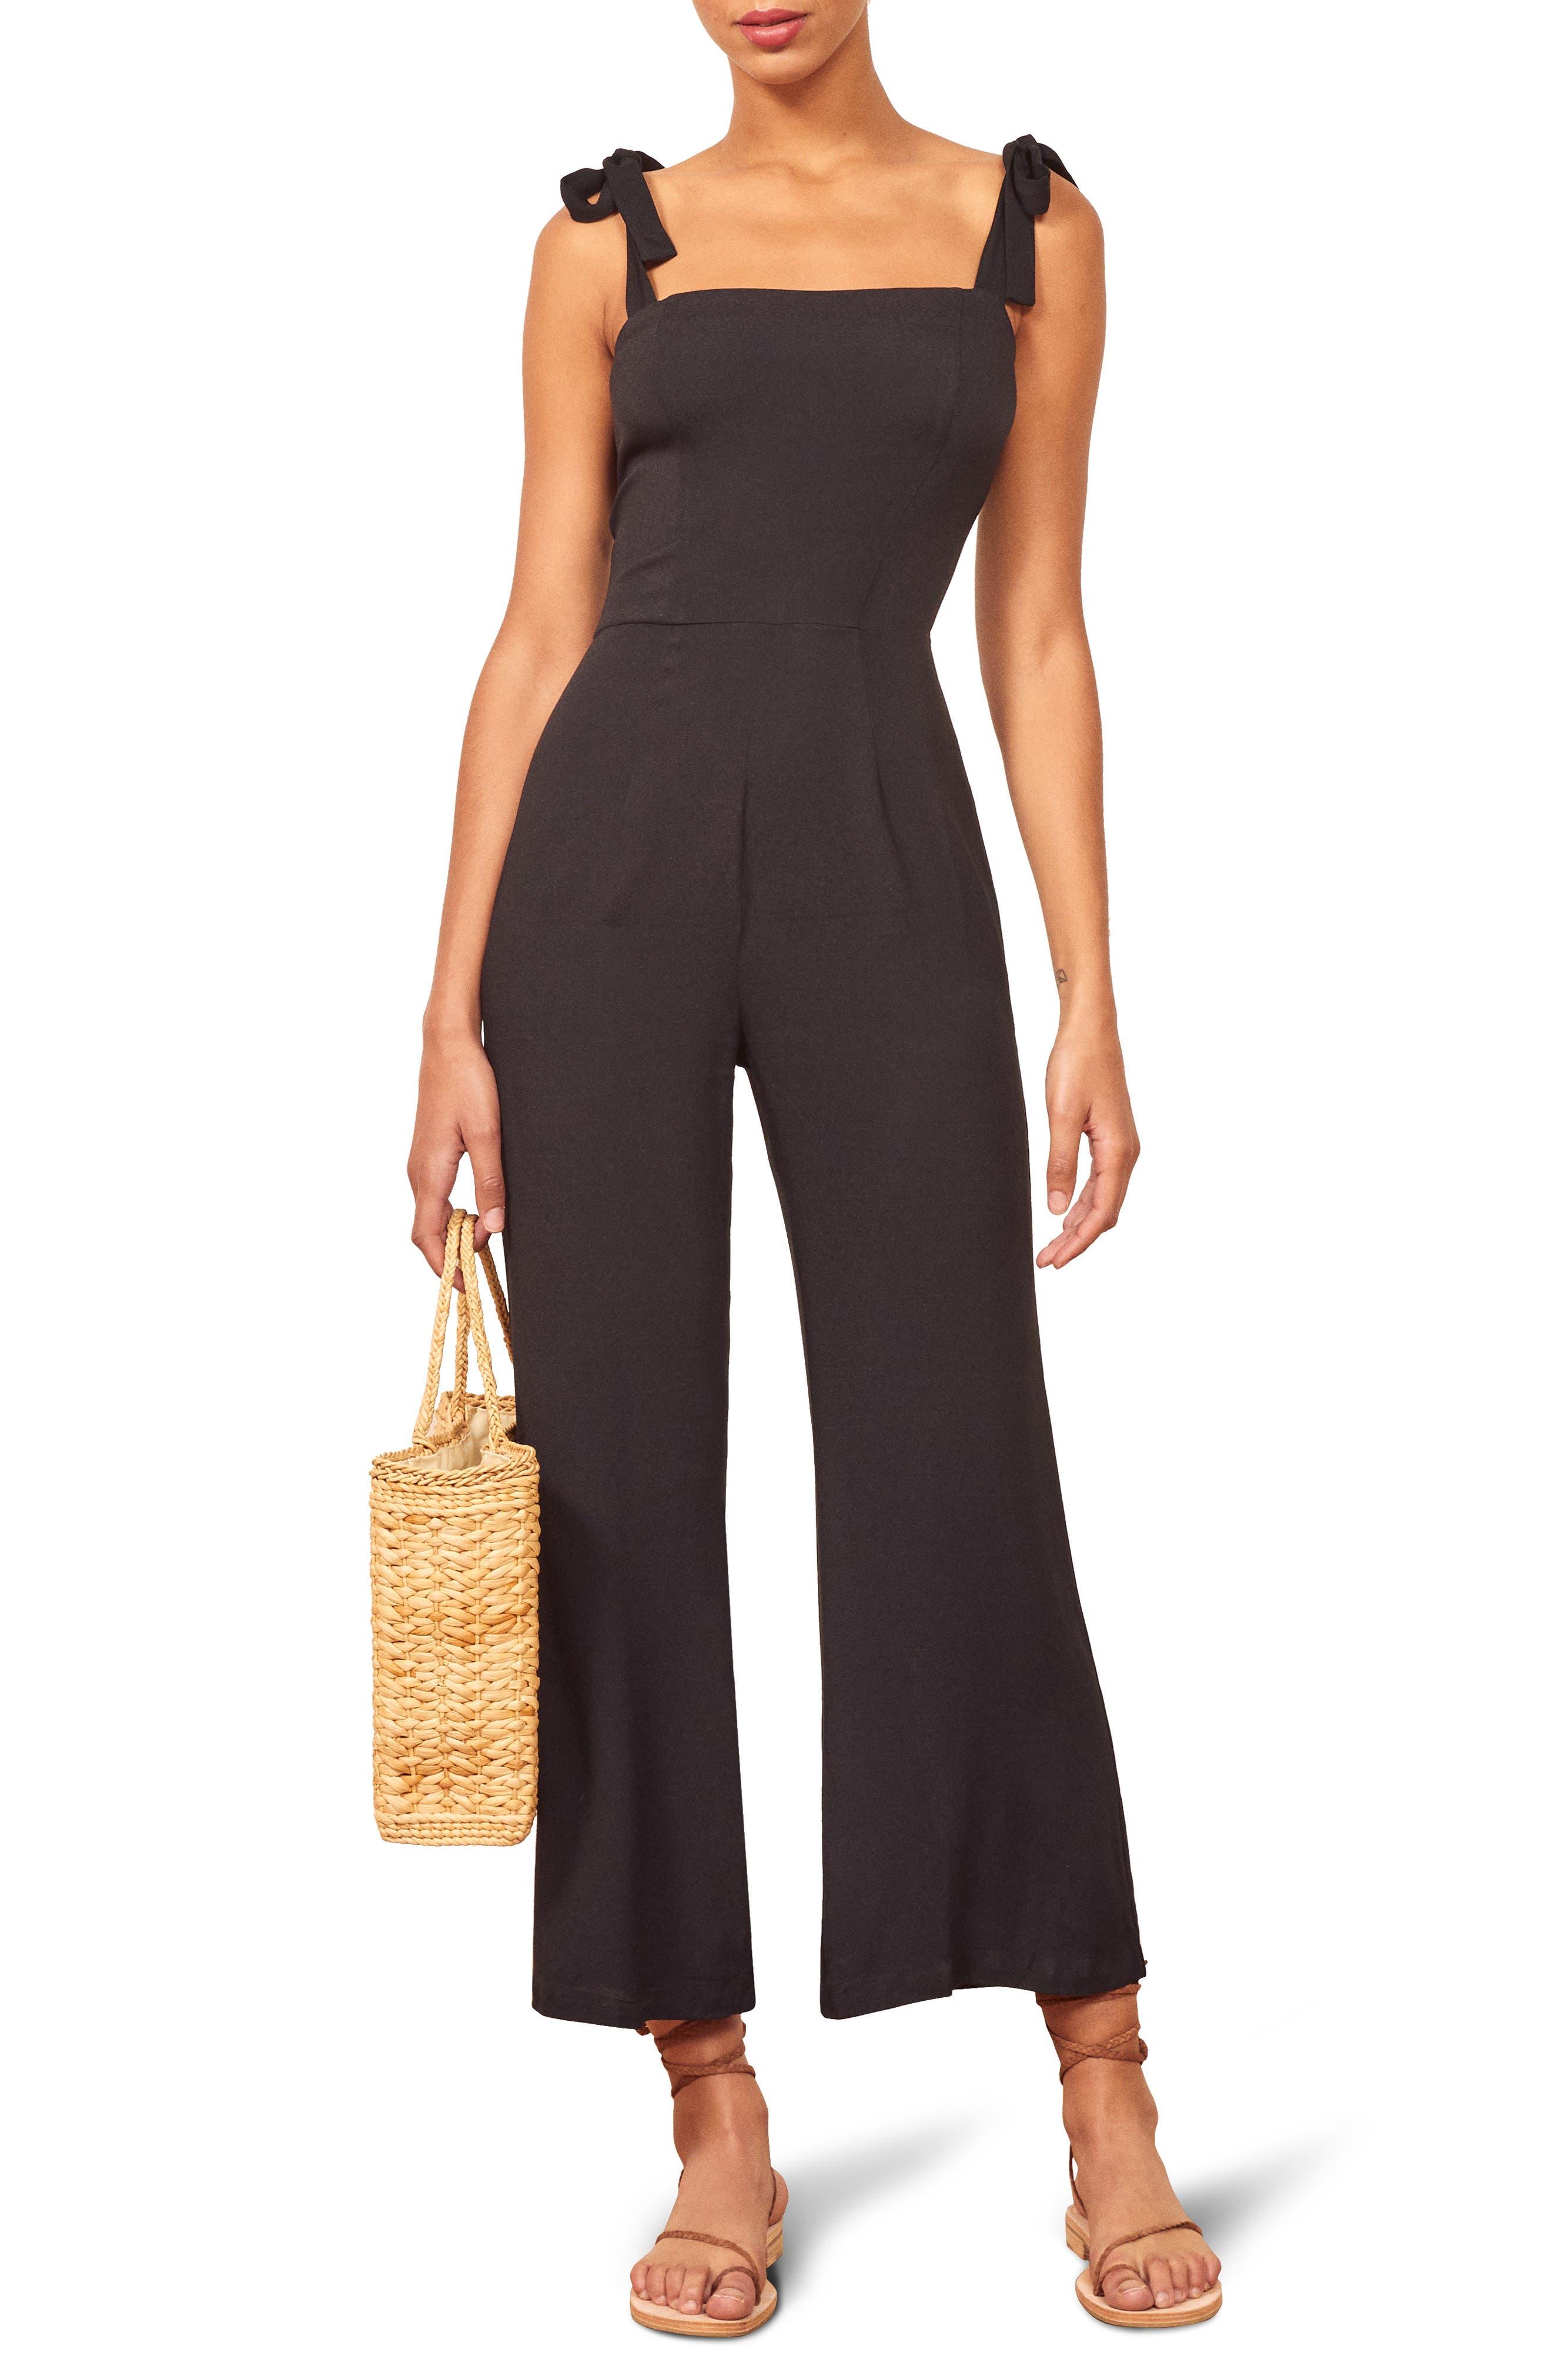 Reformation Fay Sleeveless Tie Shoulder Jumpsuit, Black